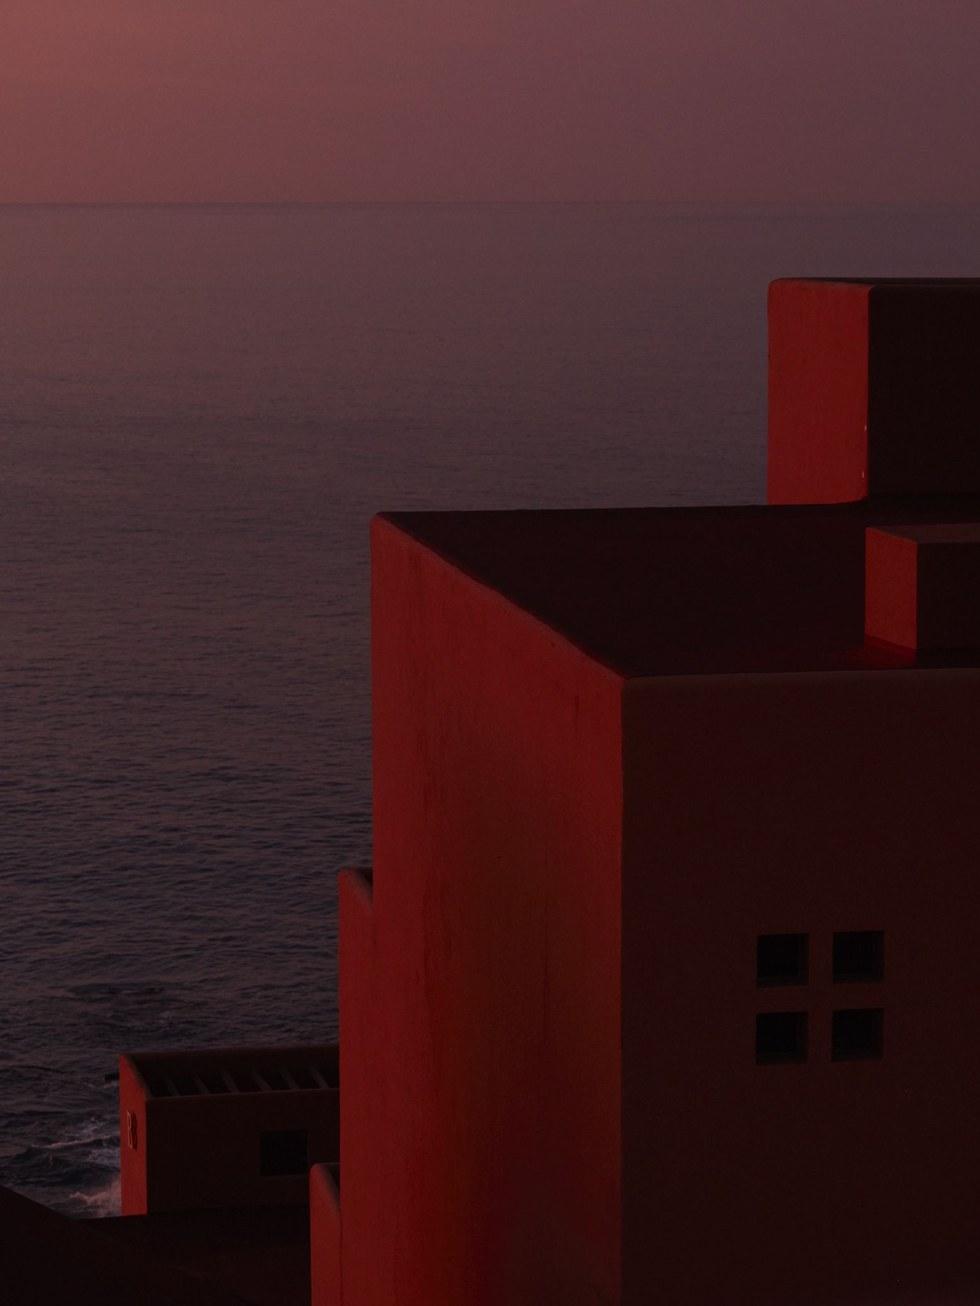 Casting shadows on San Jos\u00e9 del Cabo